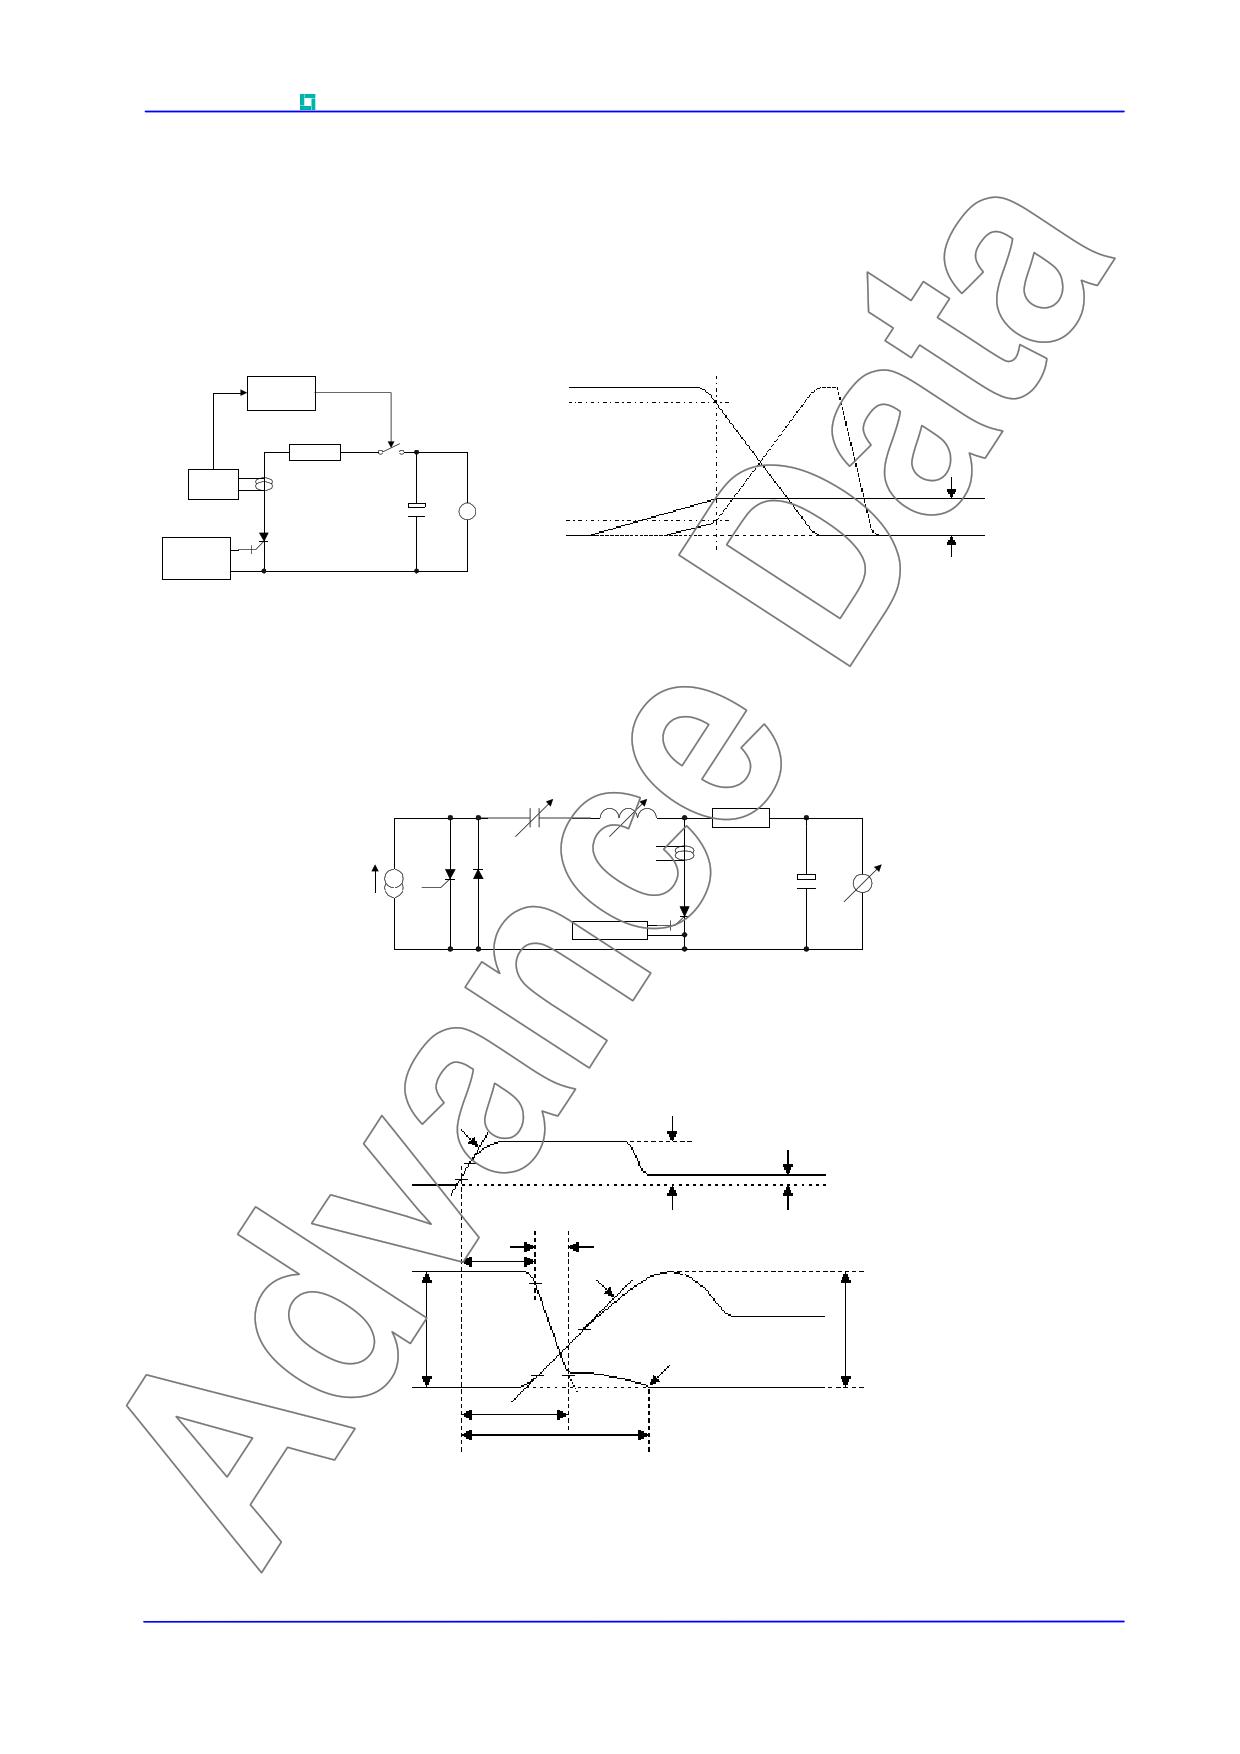 G1000QC400 電子部品, 半導体